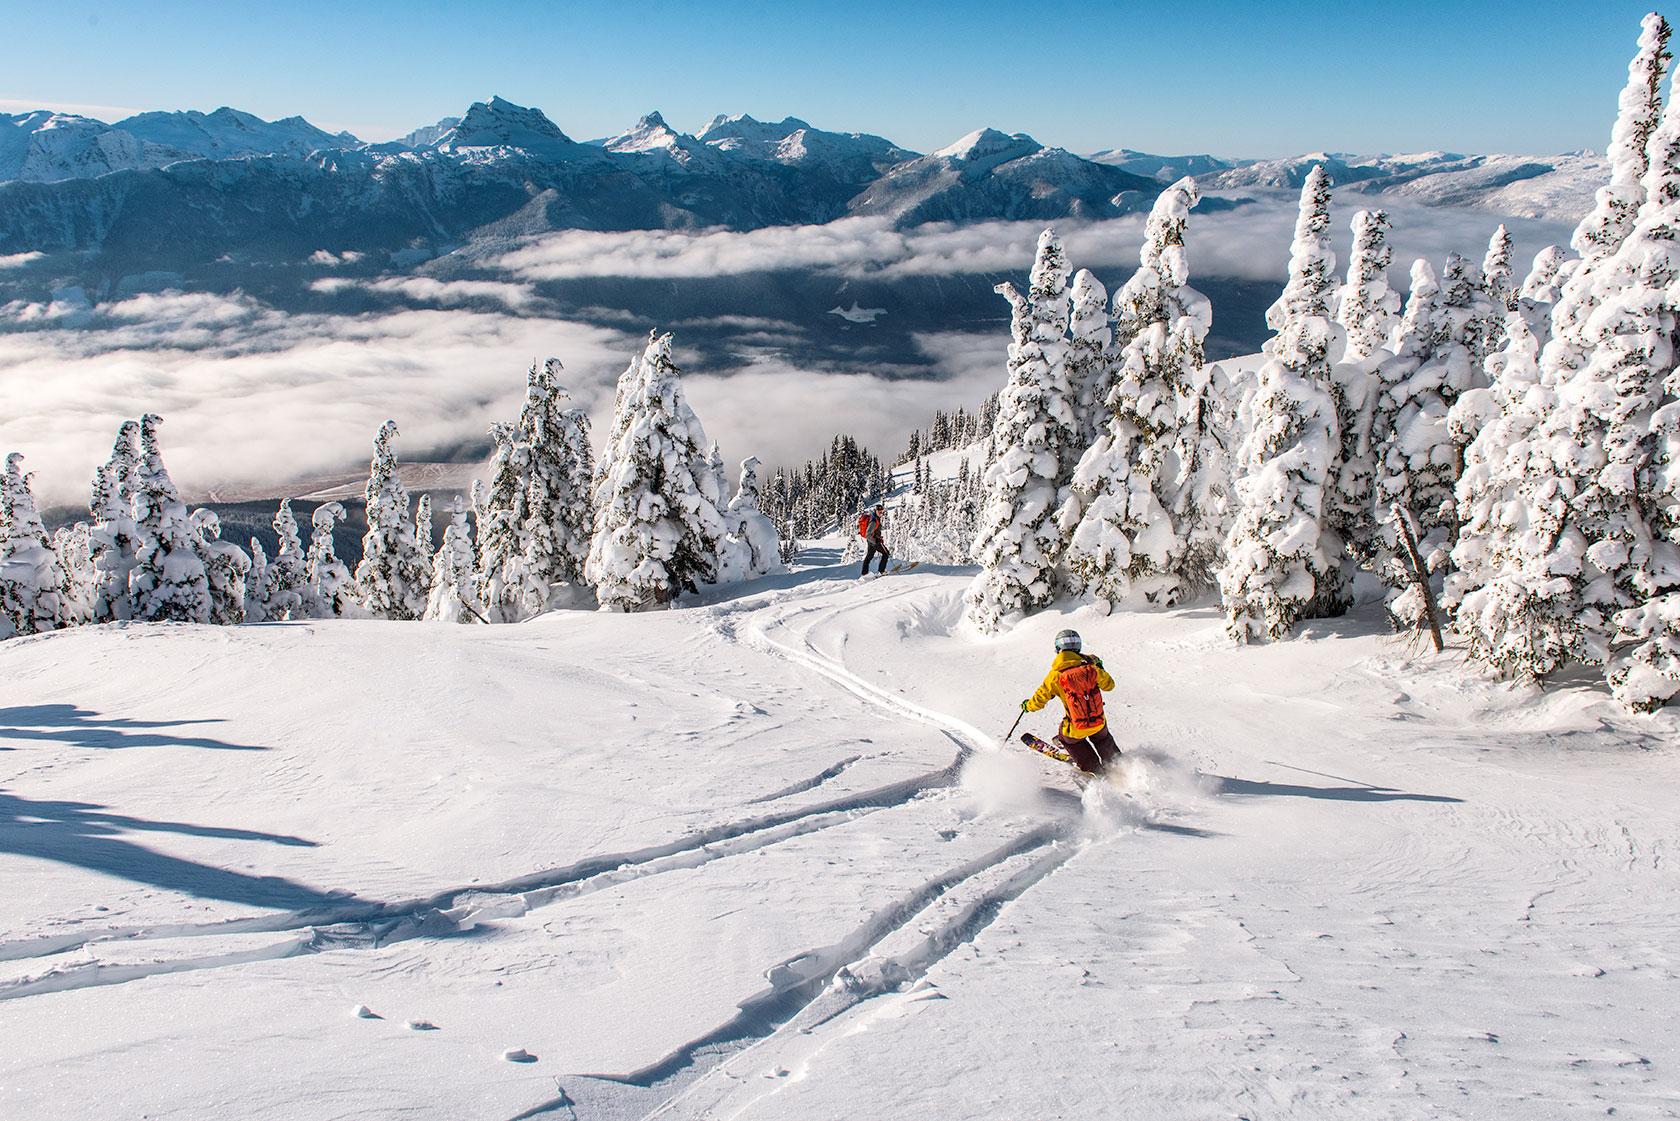 austin-trigg-patagonia-revelstoke-bc-british-columbia-mountains-valley-snow-skiing-touring-backcountry-adventure.jpg